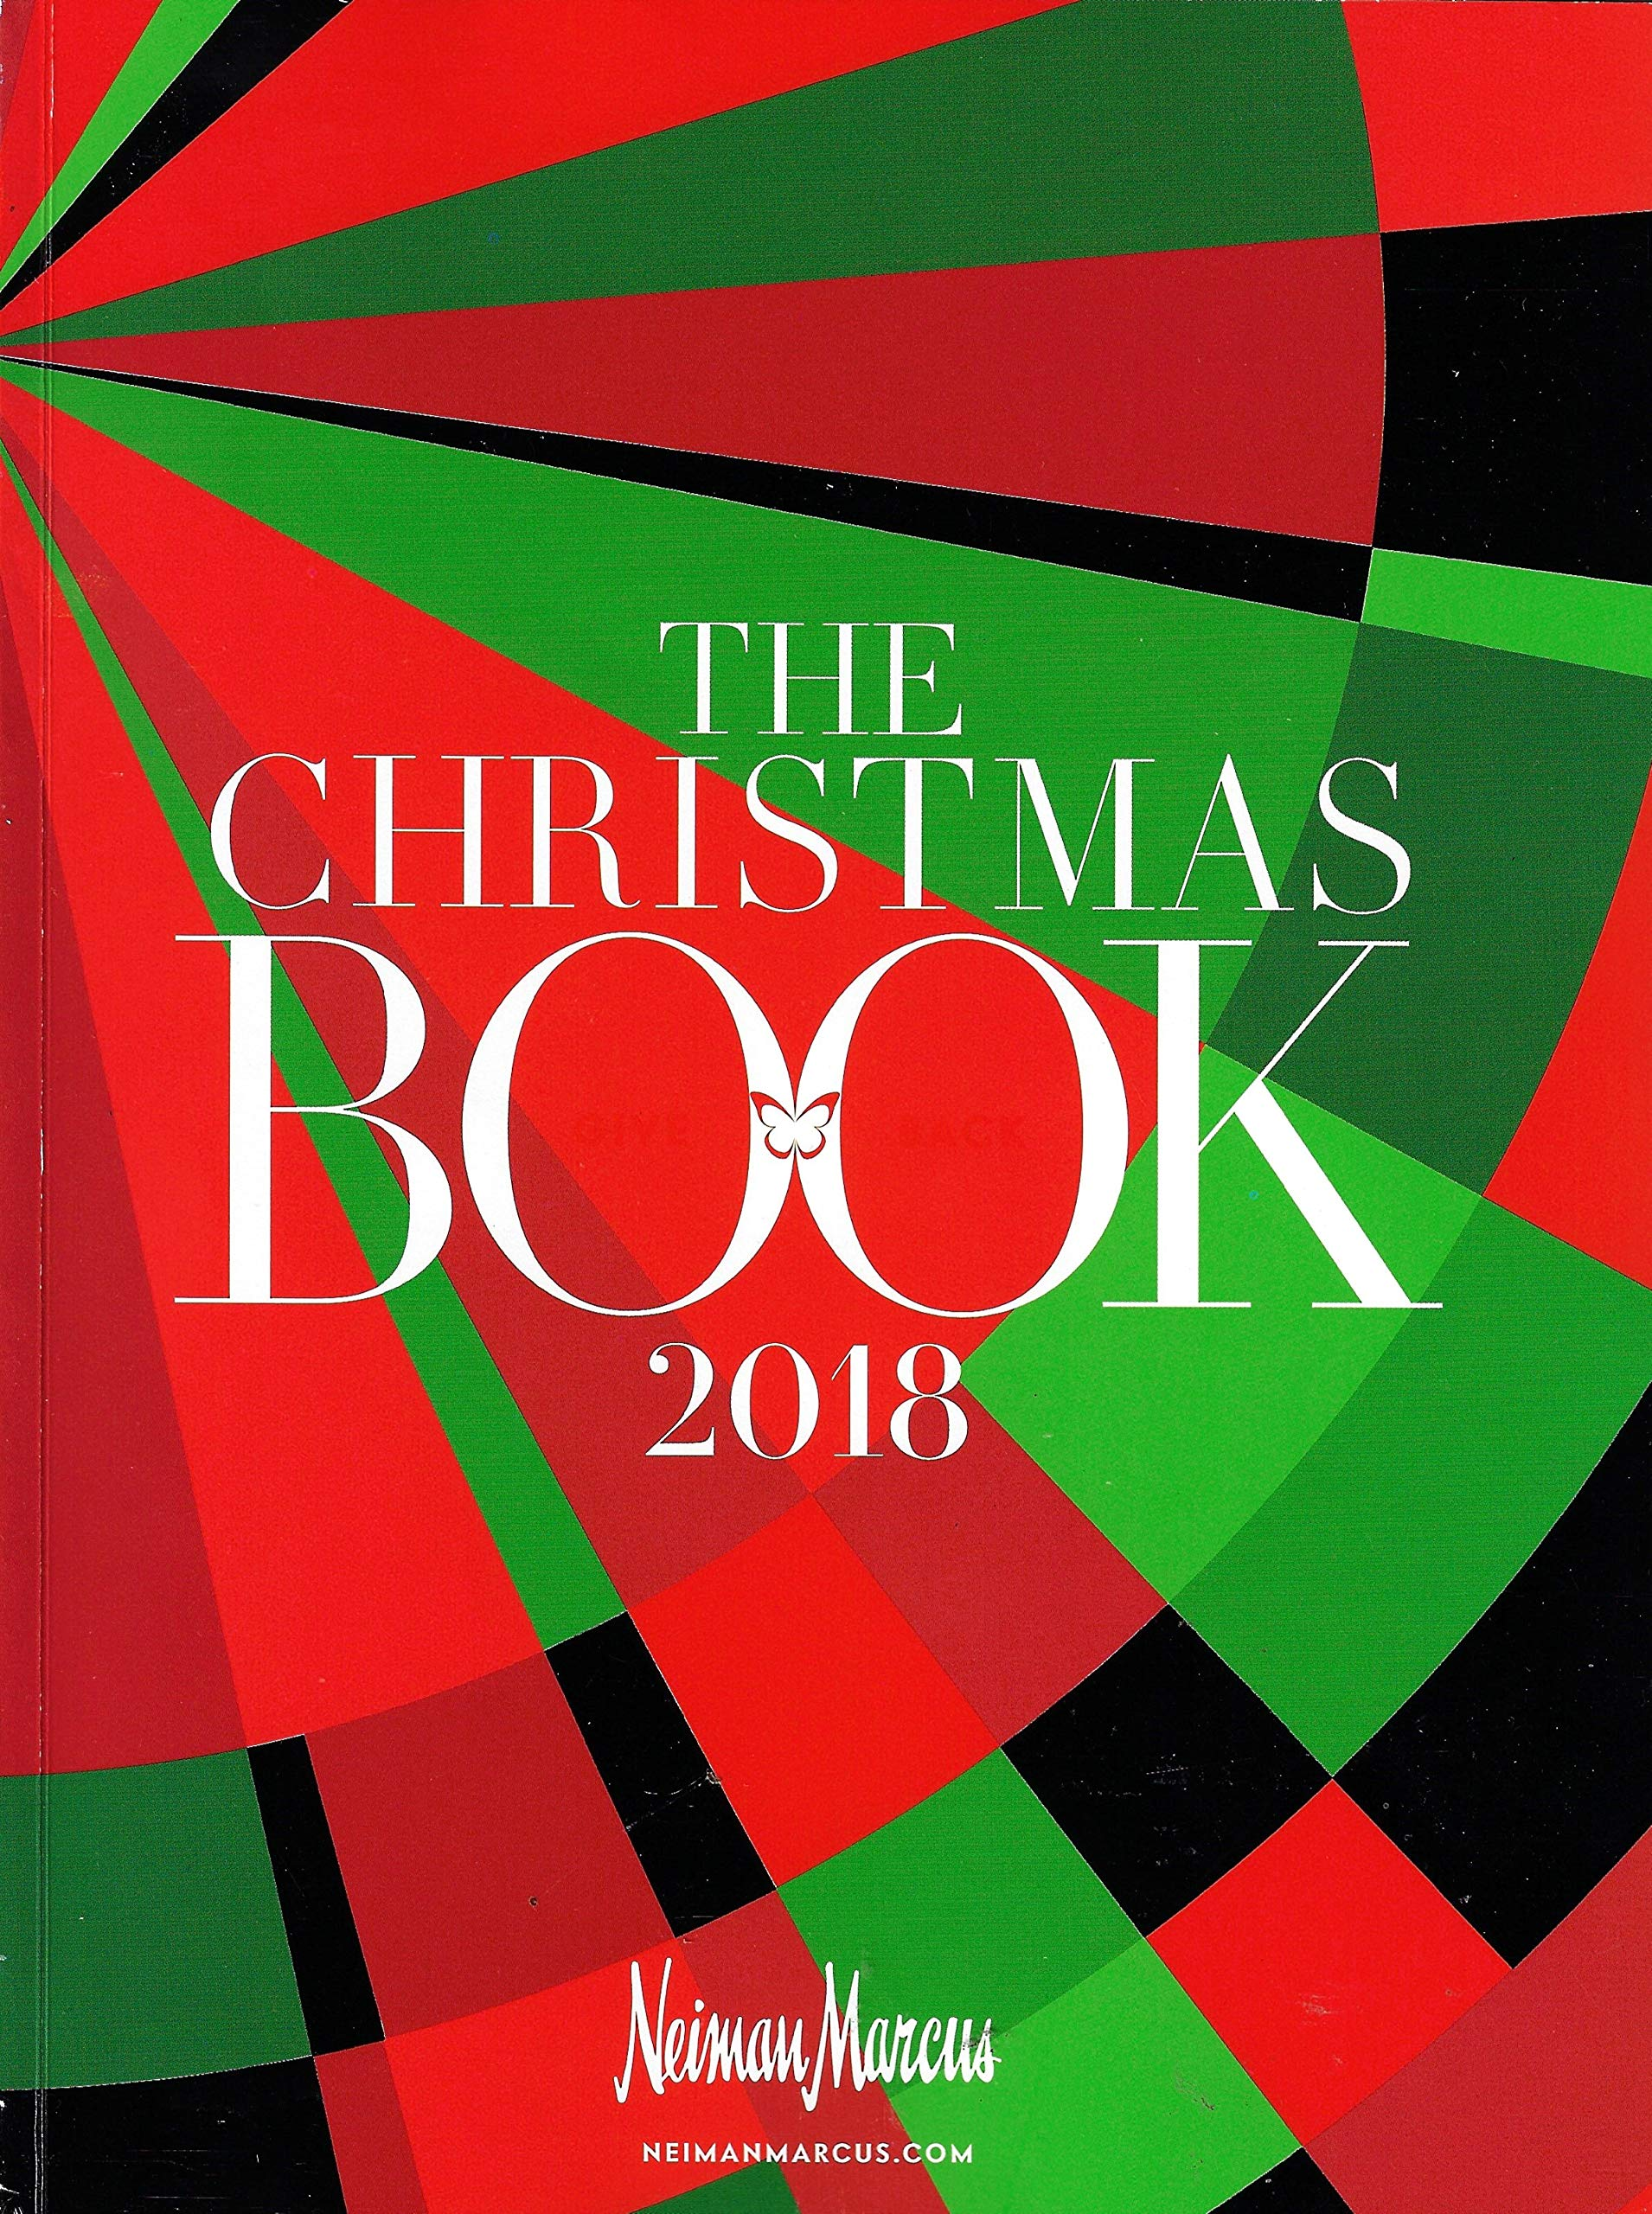 Neiman Marcus Christmas Book.Neiman Marcus Christmas Book 2018 Amazon Com Books